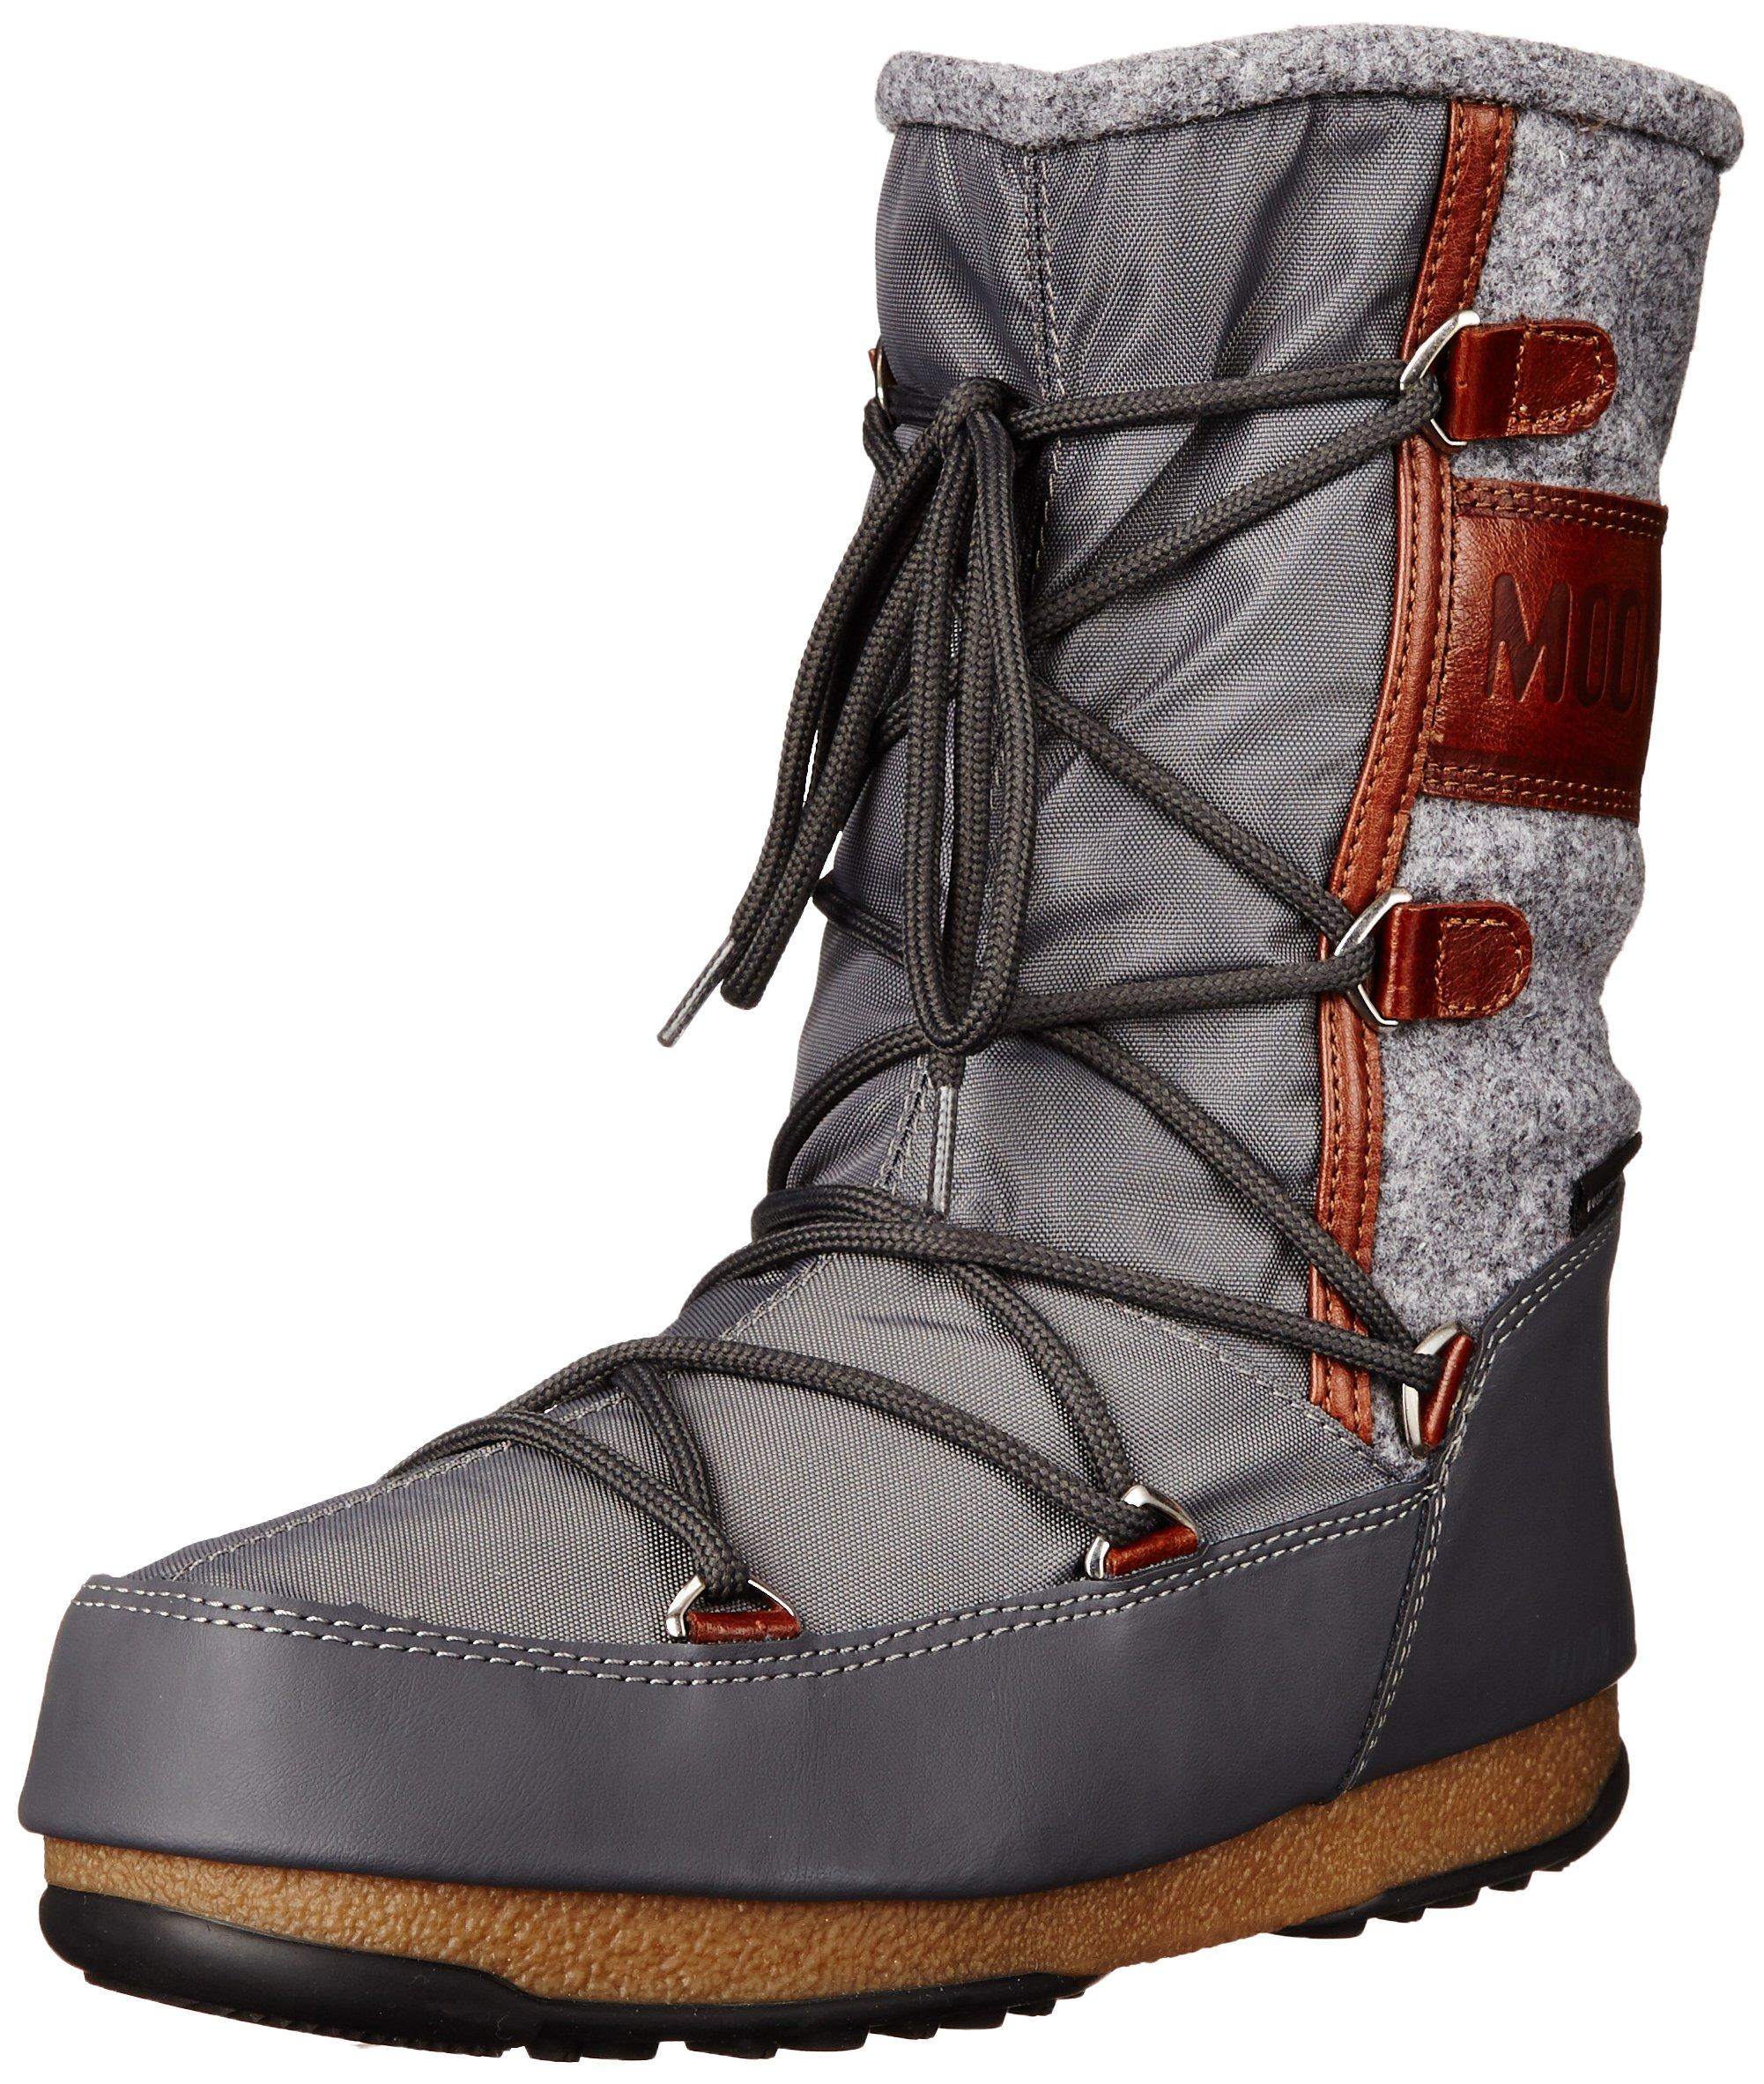 Tecnica Women's Moon W.E. Vienna Felt Winter Fashion Boot, Gray, 41 EU/9-9.5 M US